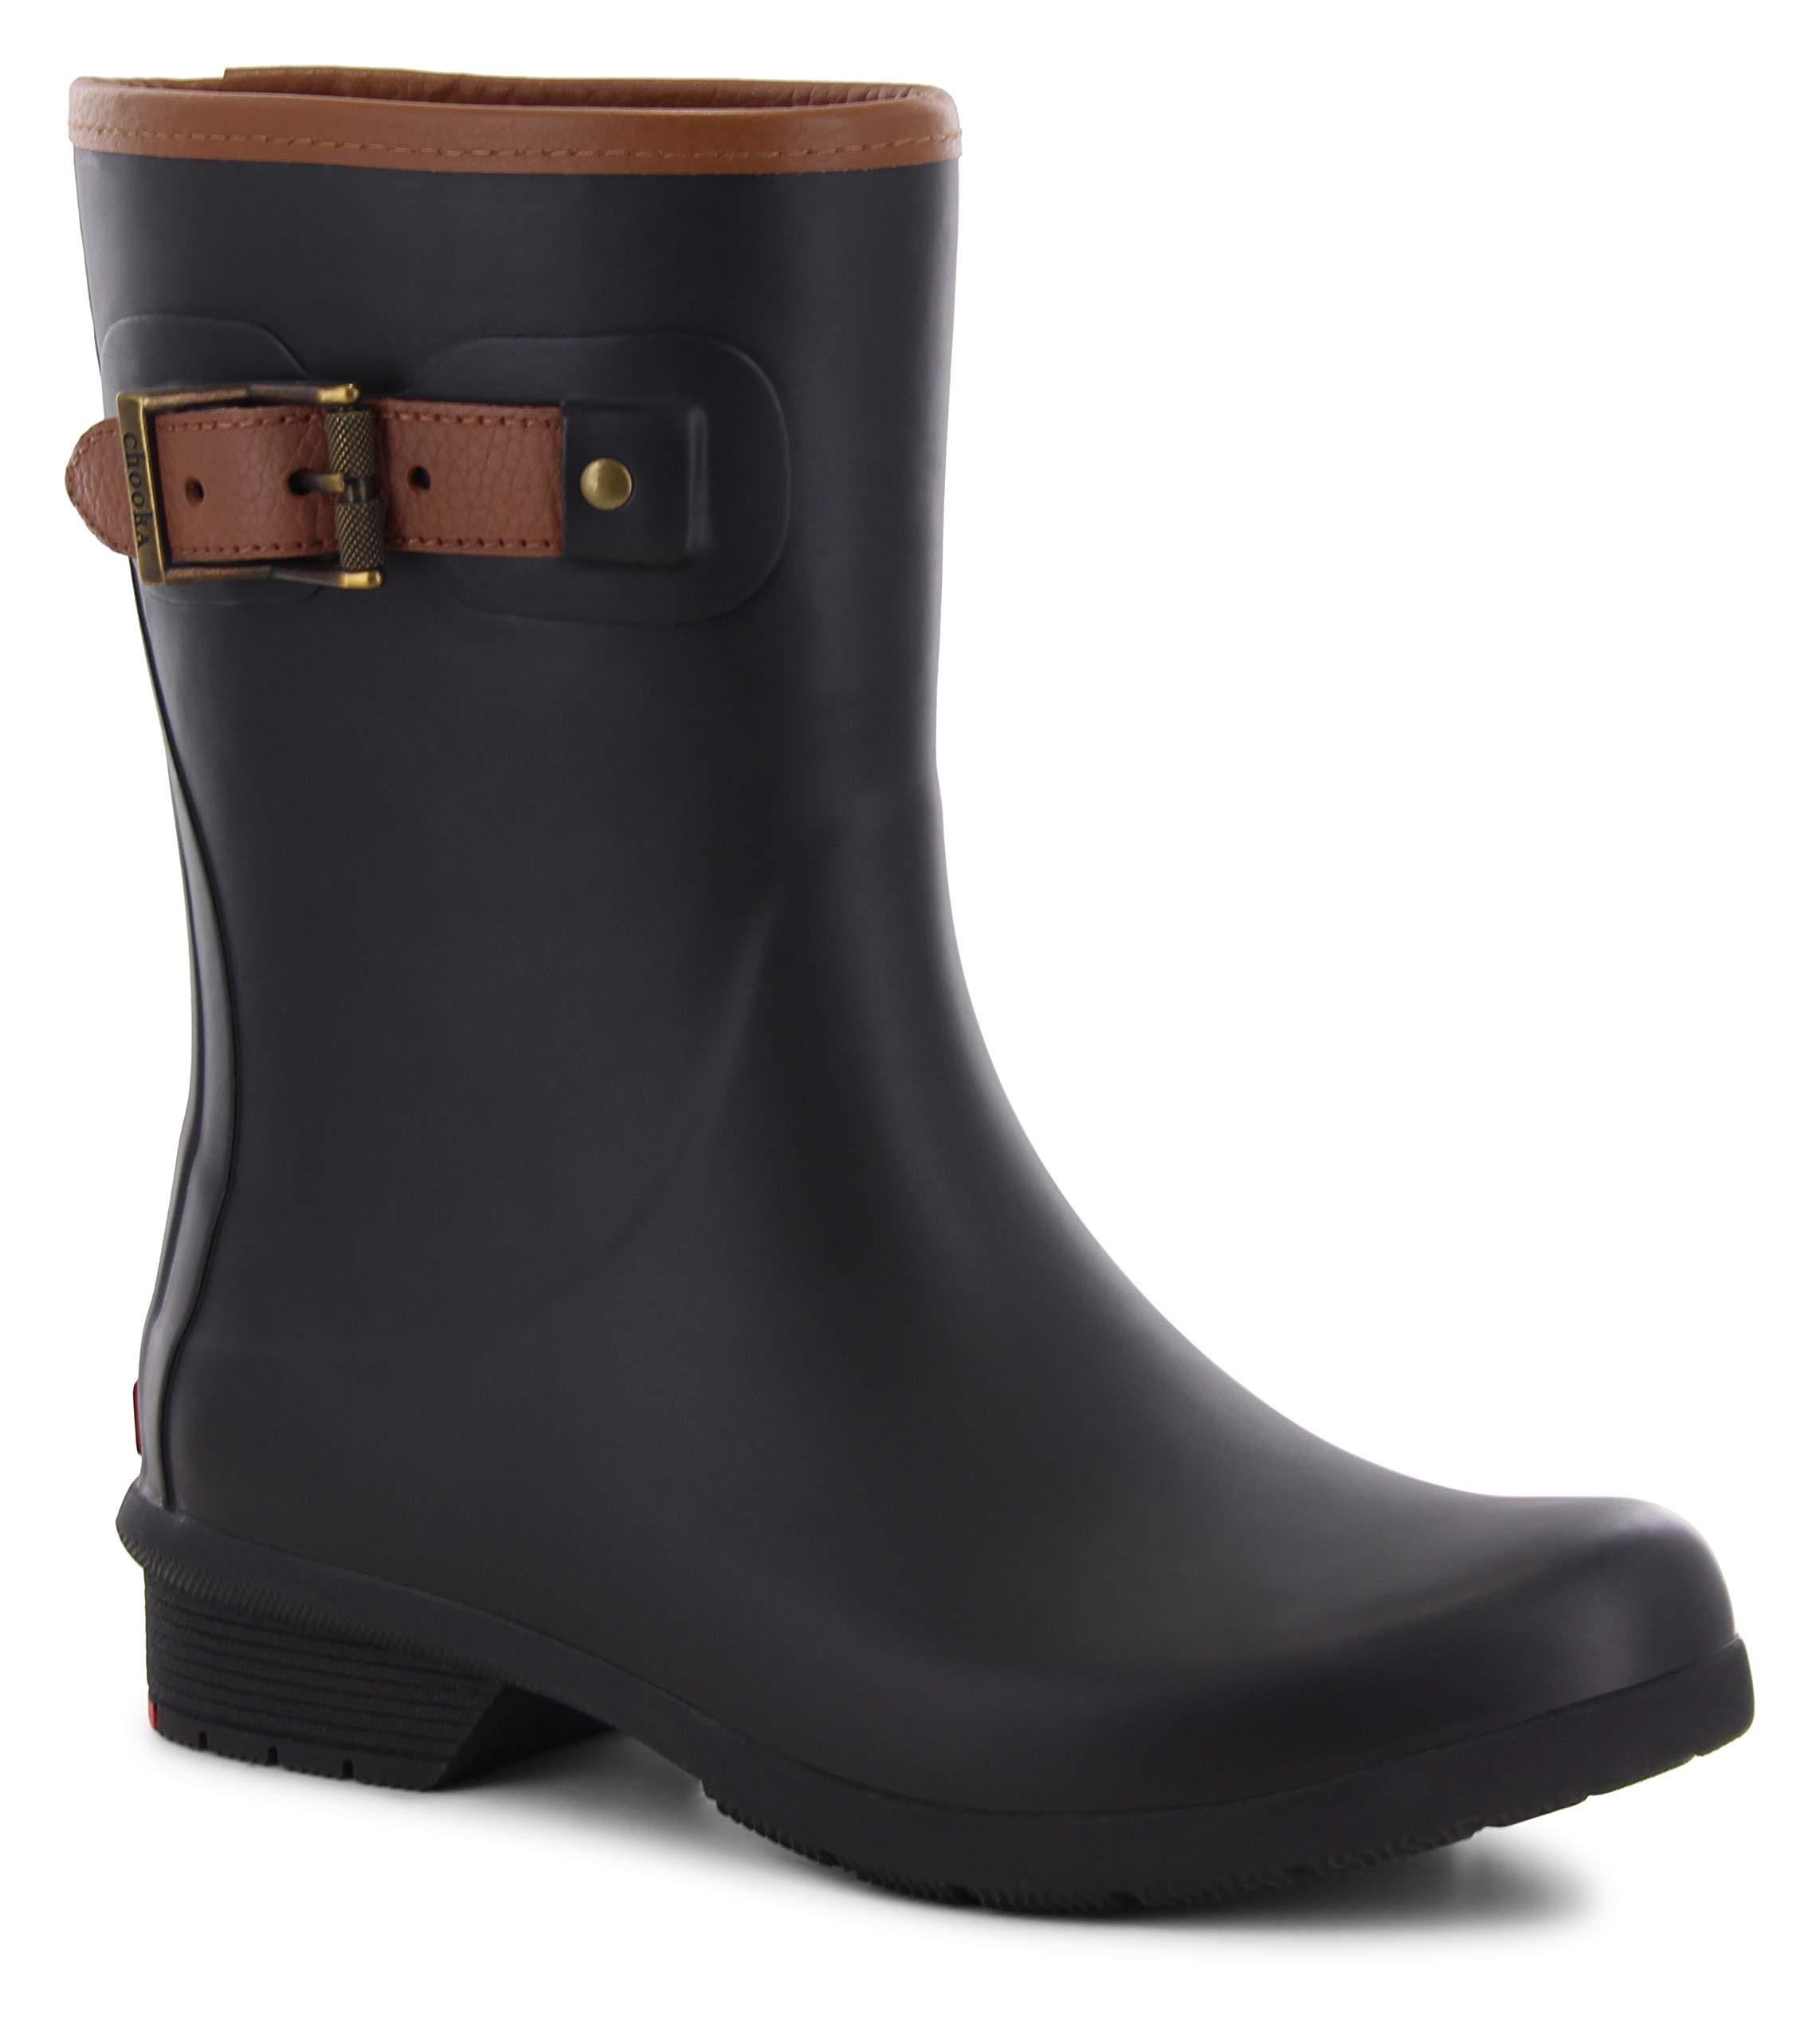 Chooka Women's Mid-Height Memory Foam Rain Boot, Black, 8 M US by Chooka